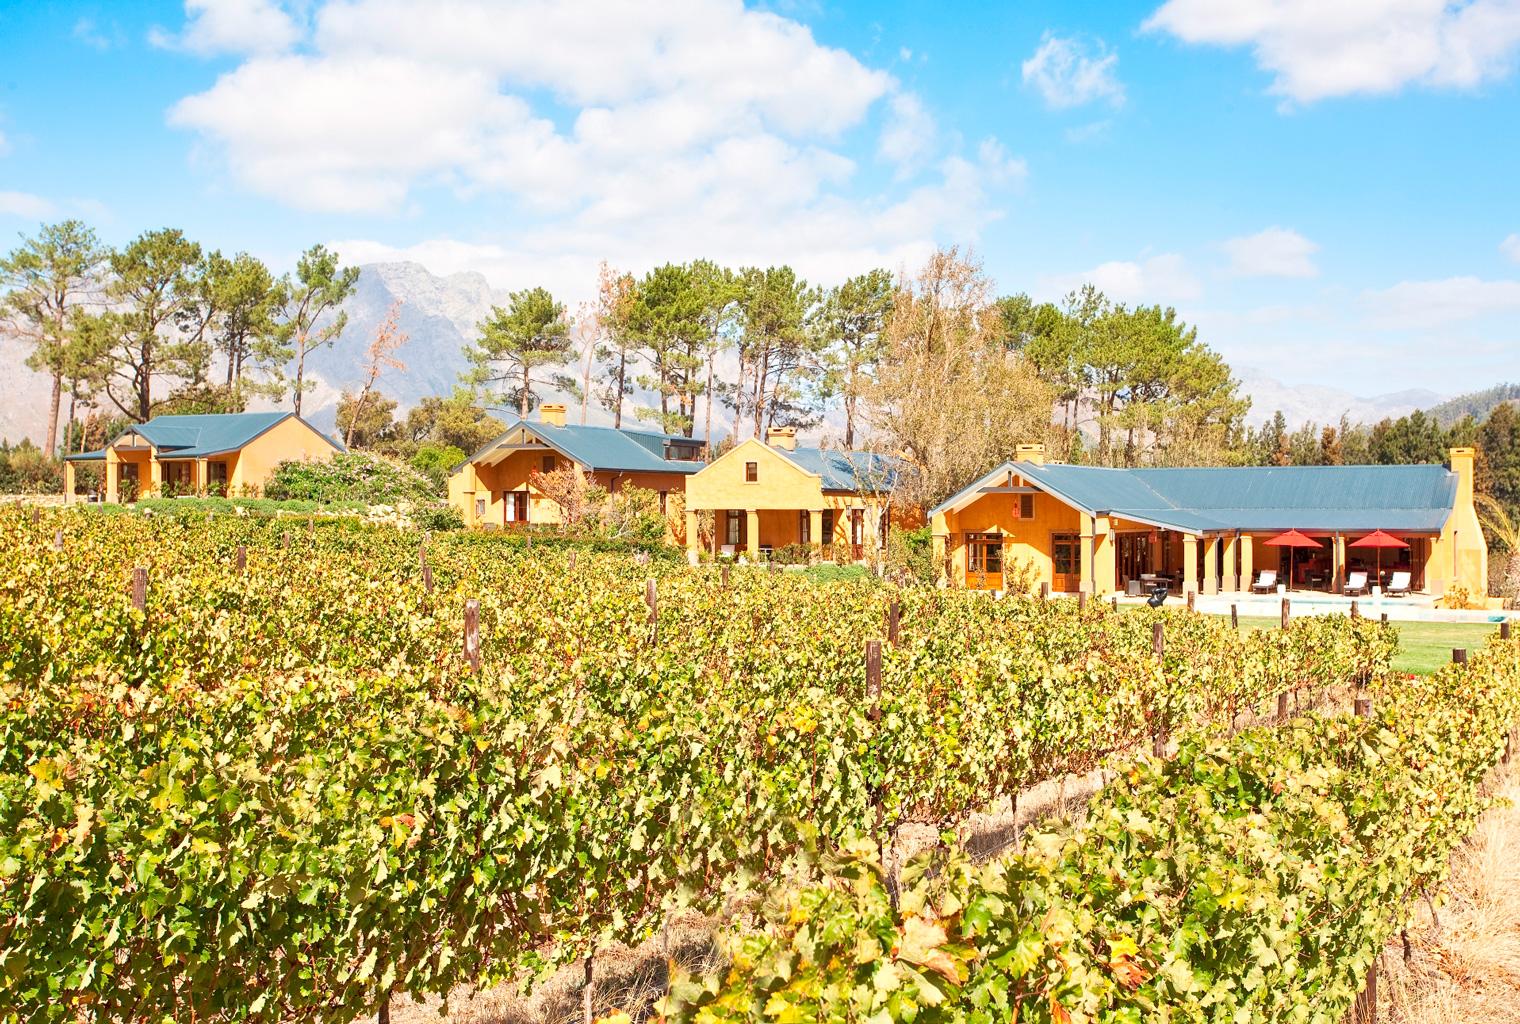 La Residence, Villas in the Vineyard